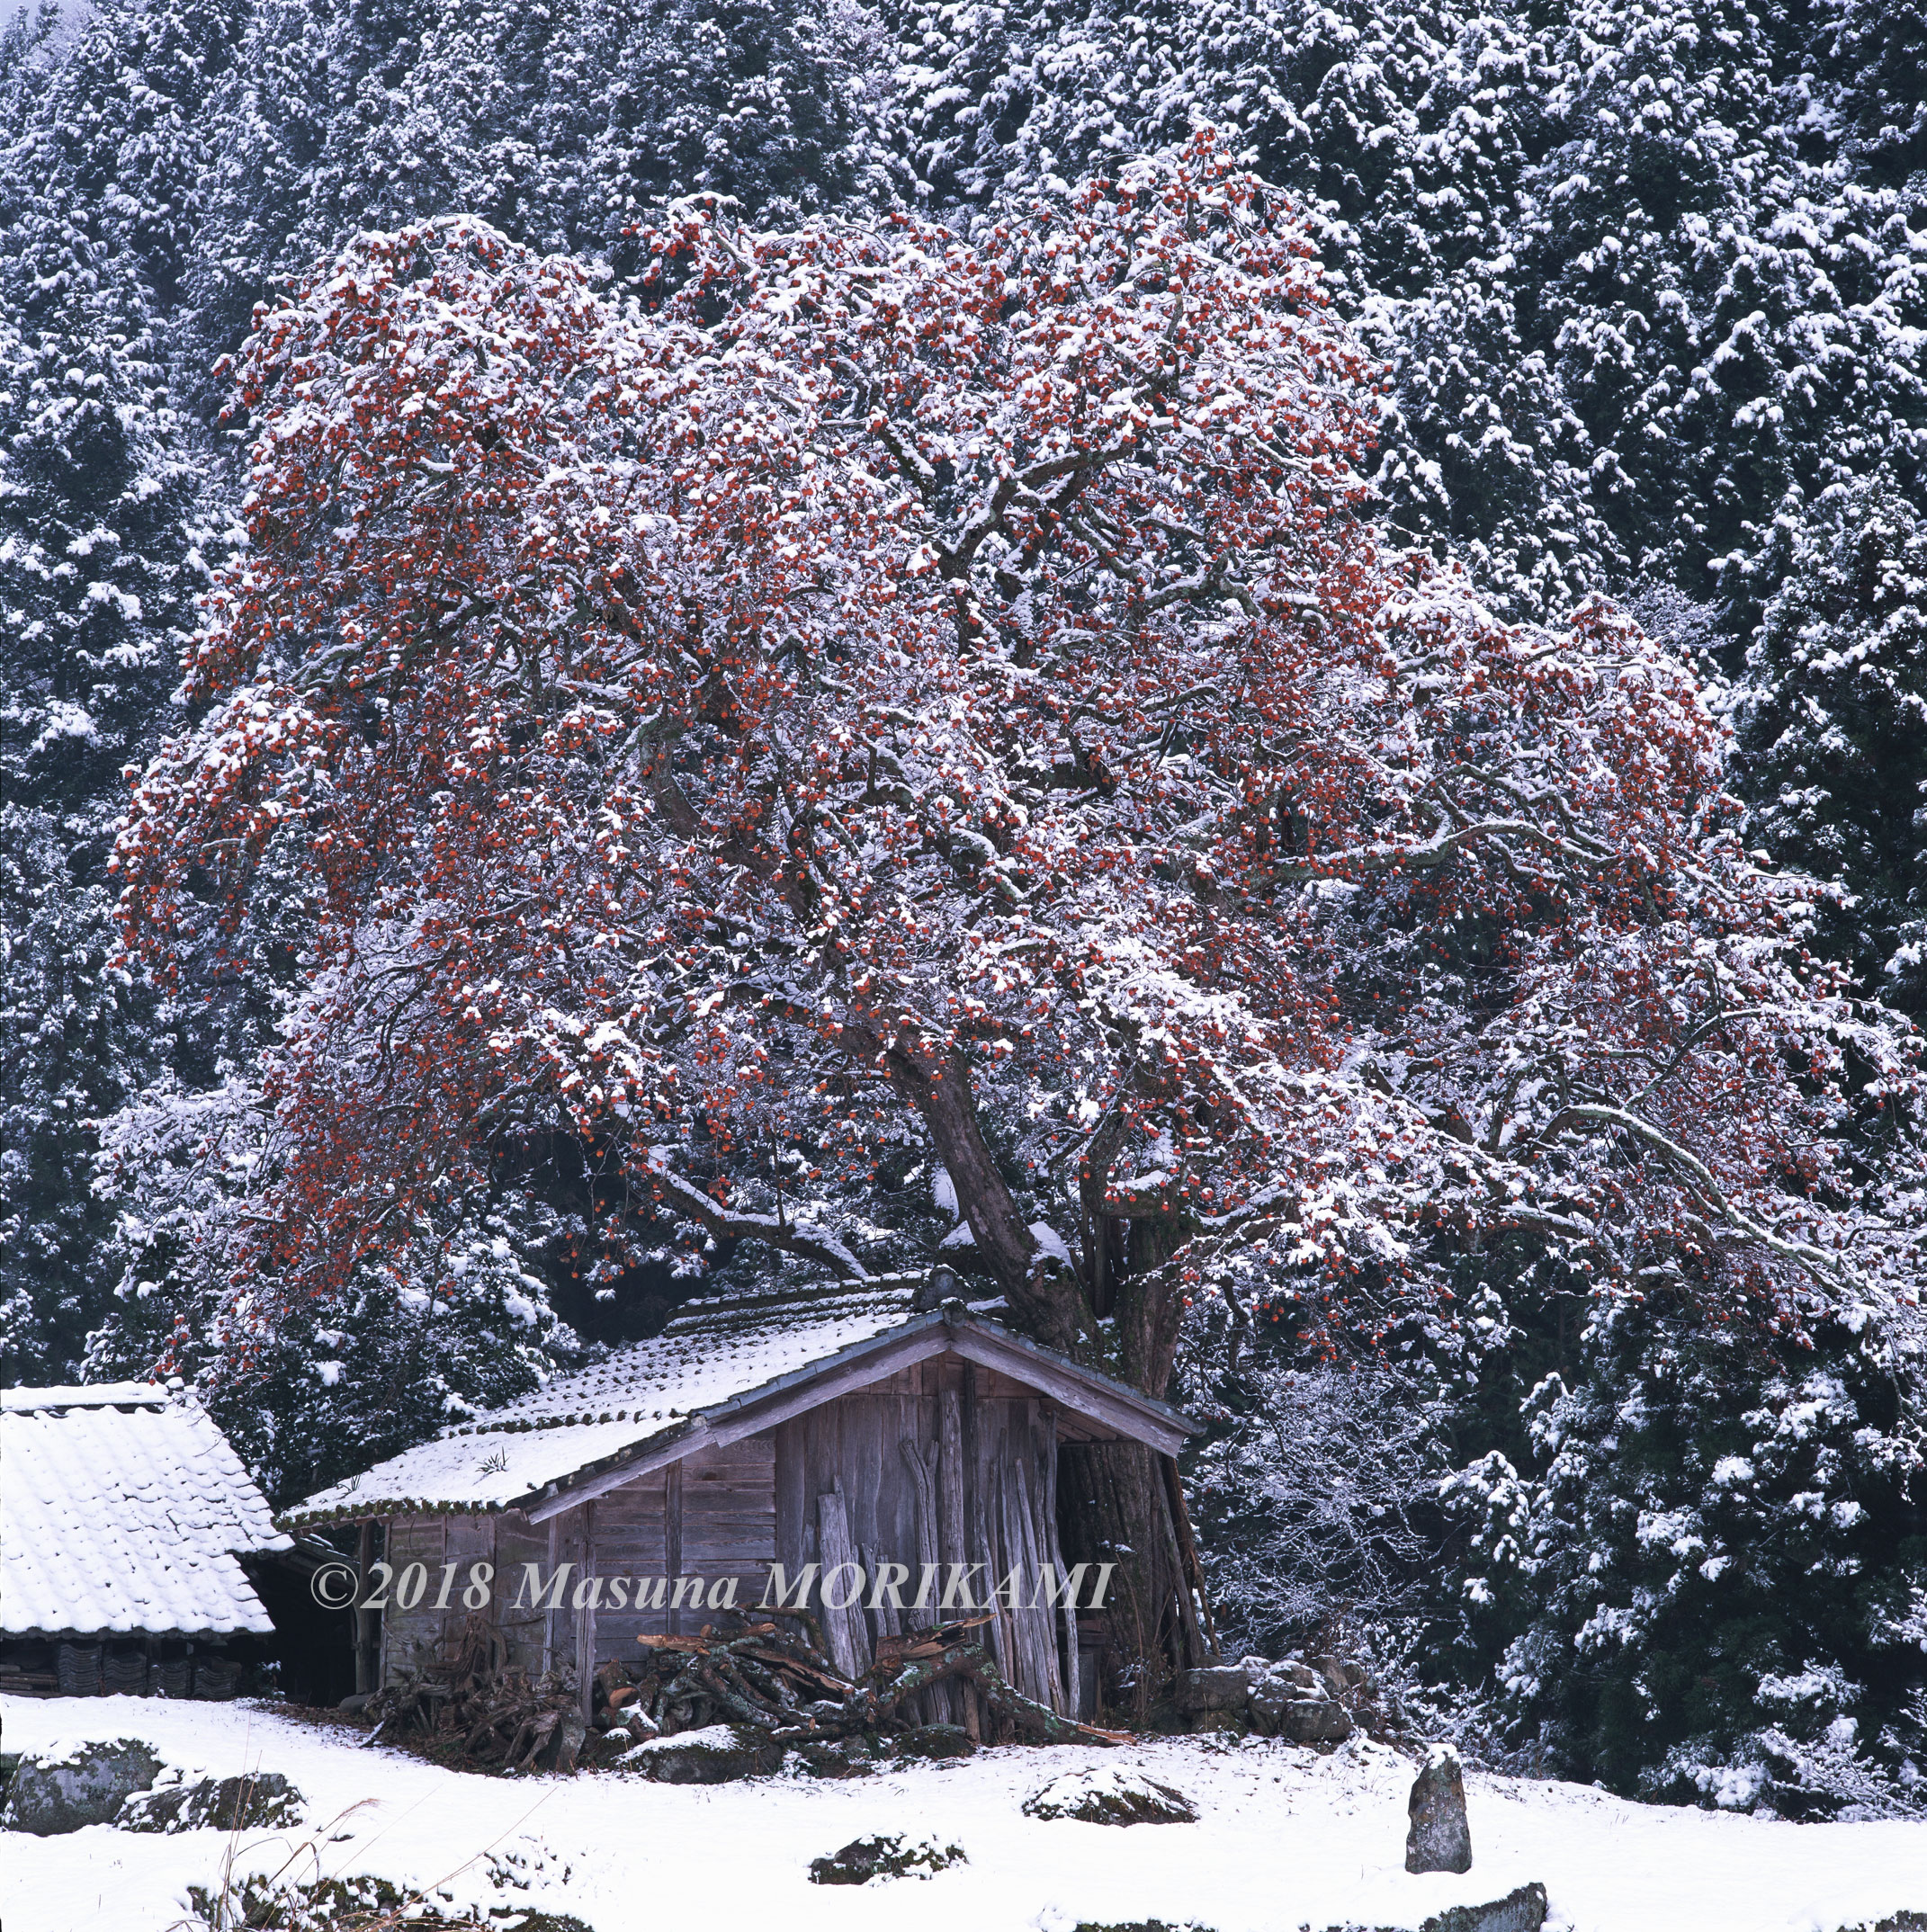 22 雪持ちの柿/長野県根羽村/2005.12.4 15:00